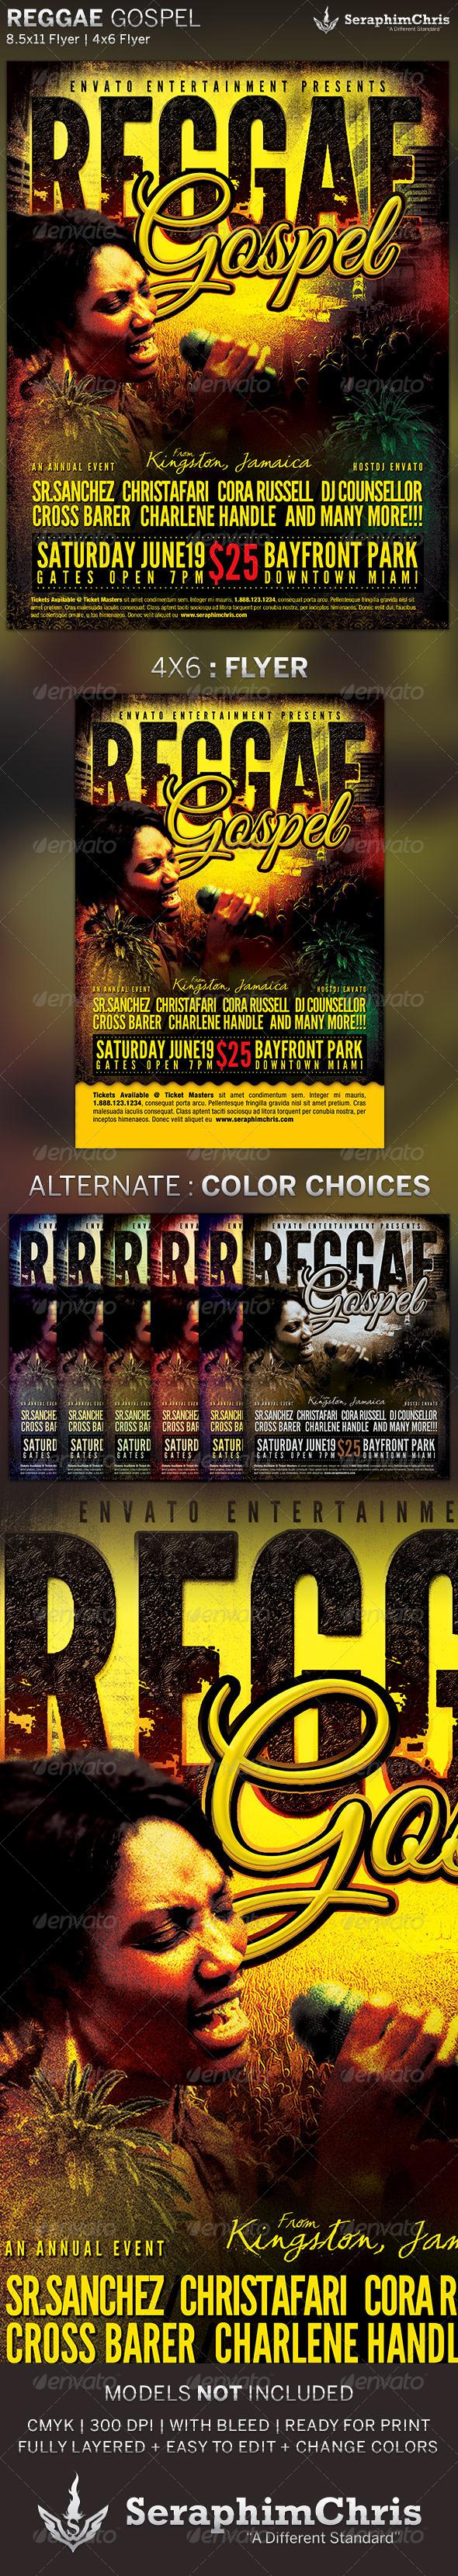 GraphicRiver Reggae Gospel Church Concert Flyer Template 4758748